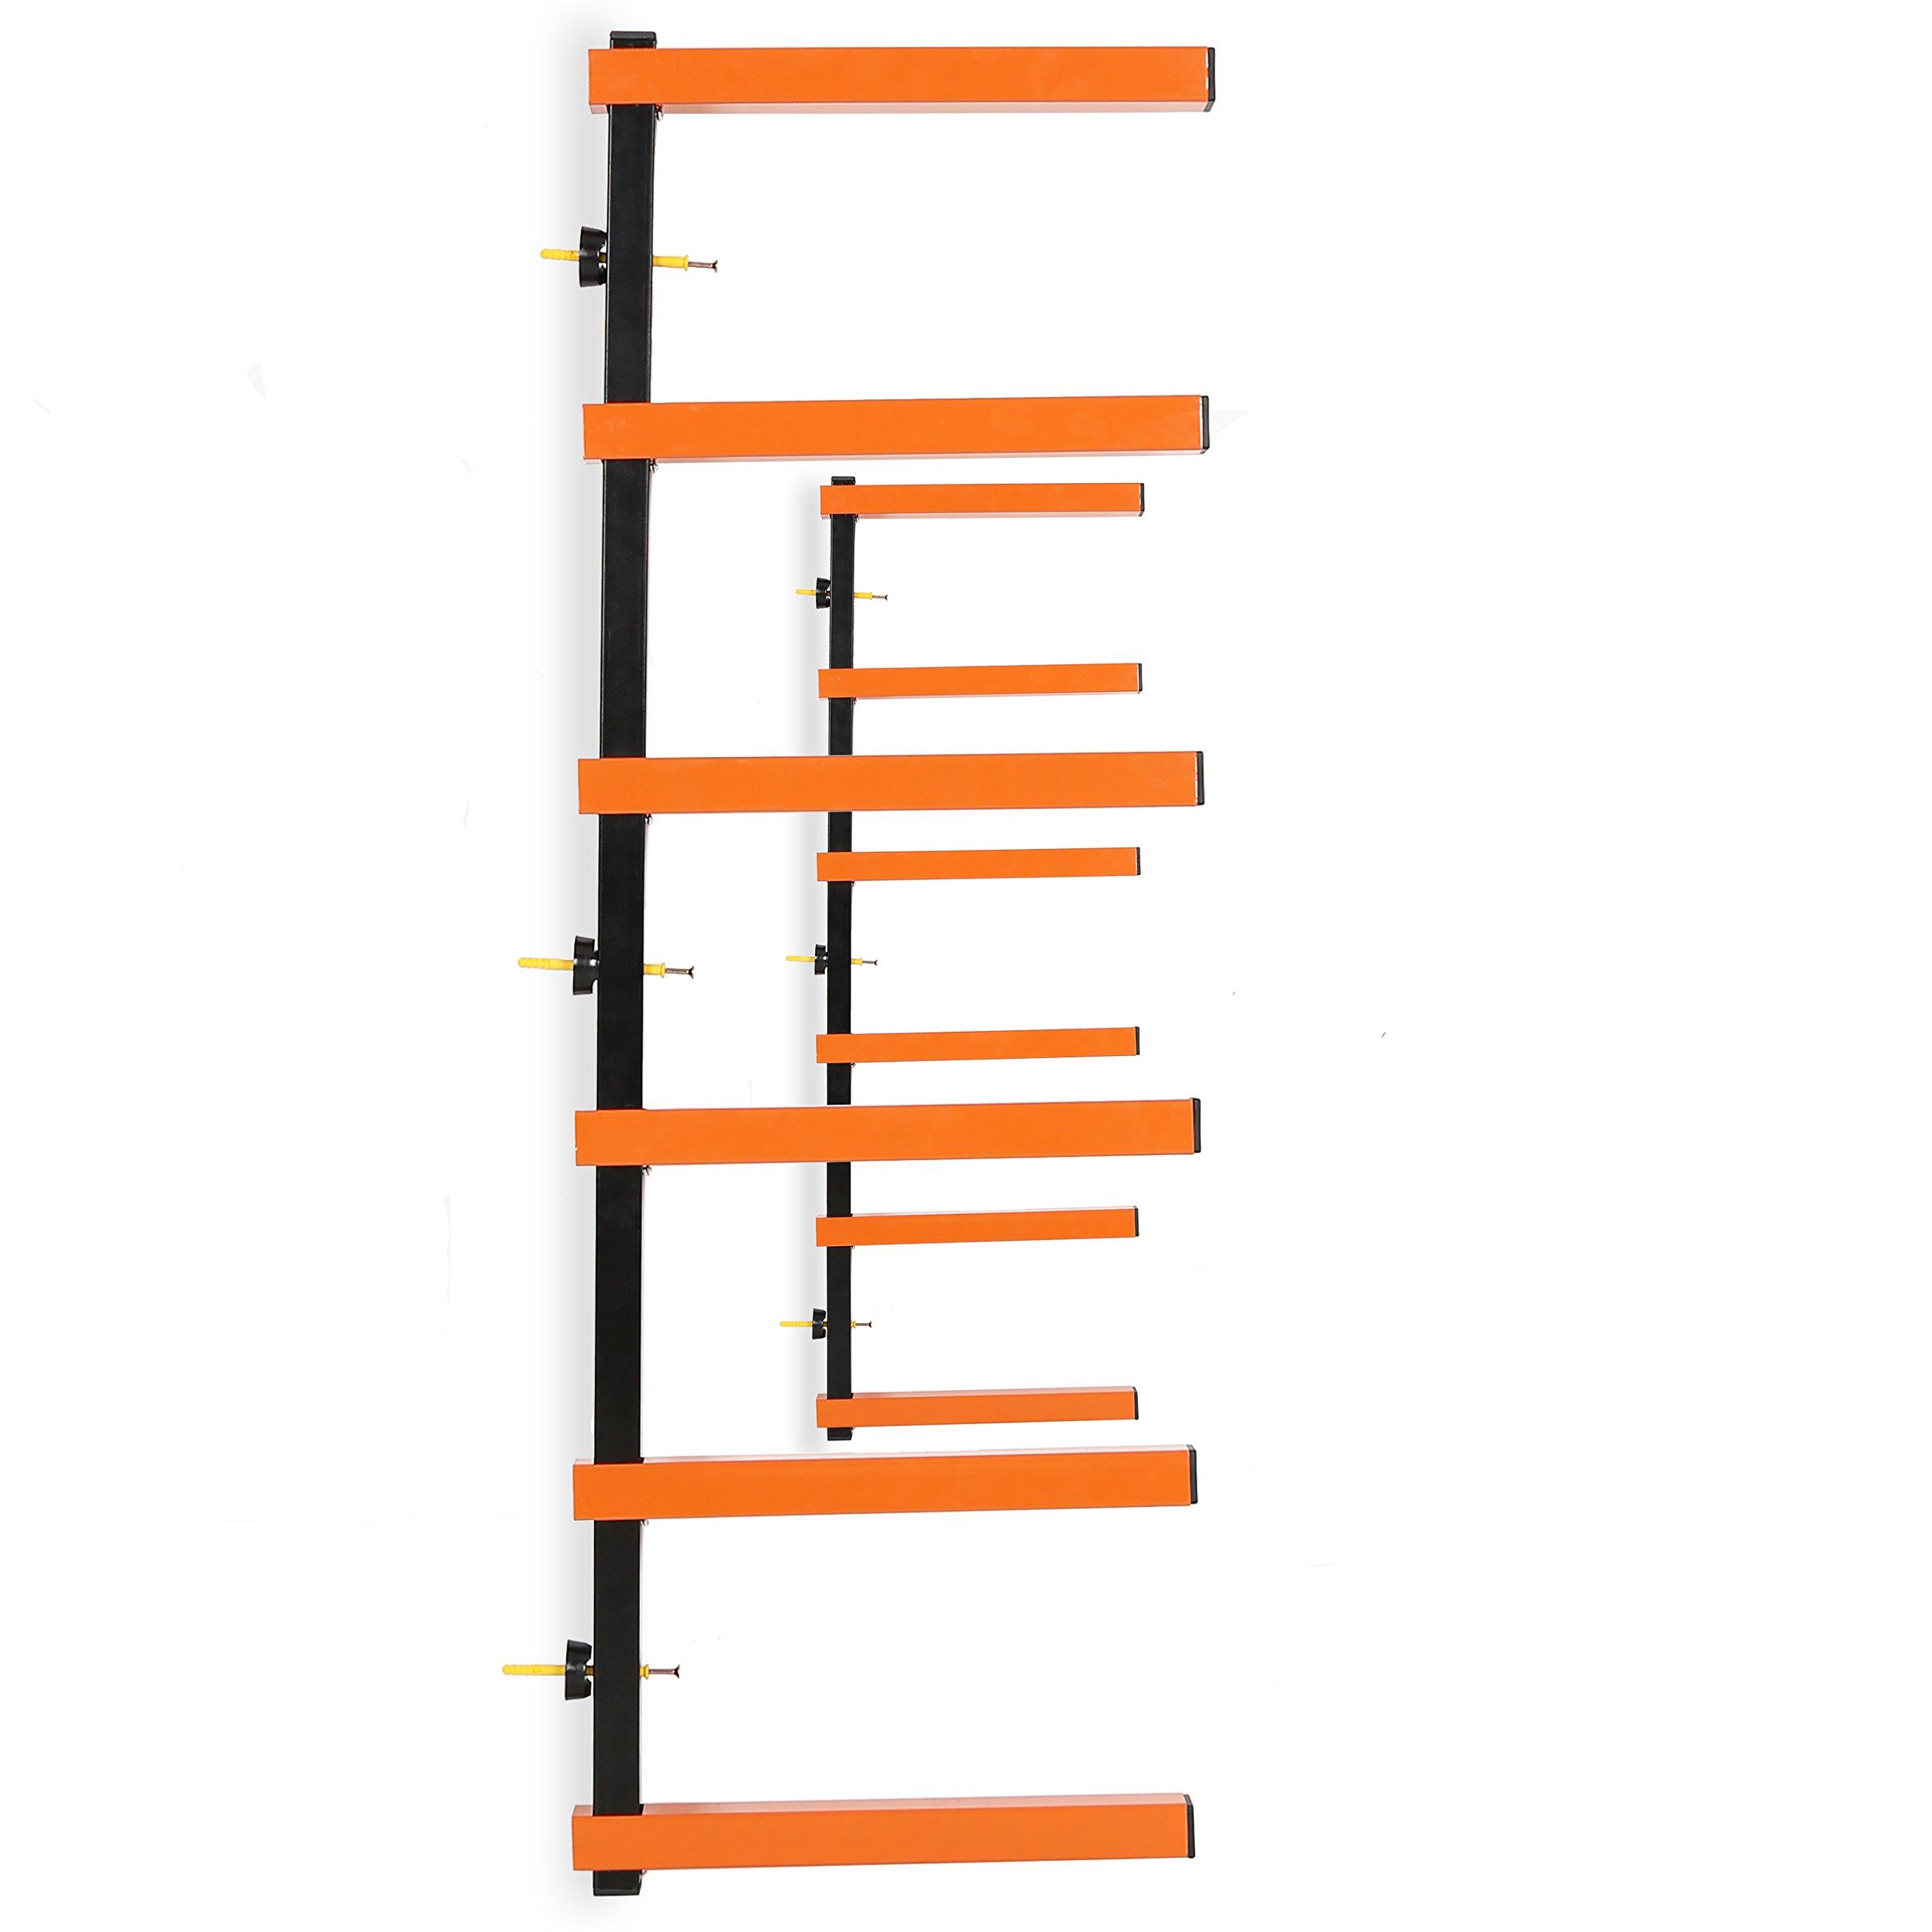 7BLACKSMITHS Six-Level 600 lb Capacity Lumber Storage Rack Wall-Mounted both Indoor and Outdoor Use Wood Organizer Rack by 7BLACKSMITHS (Image #2)